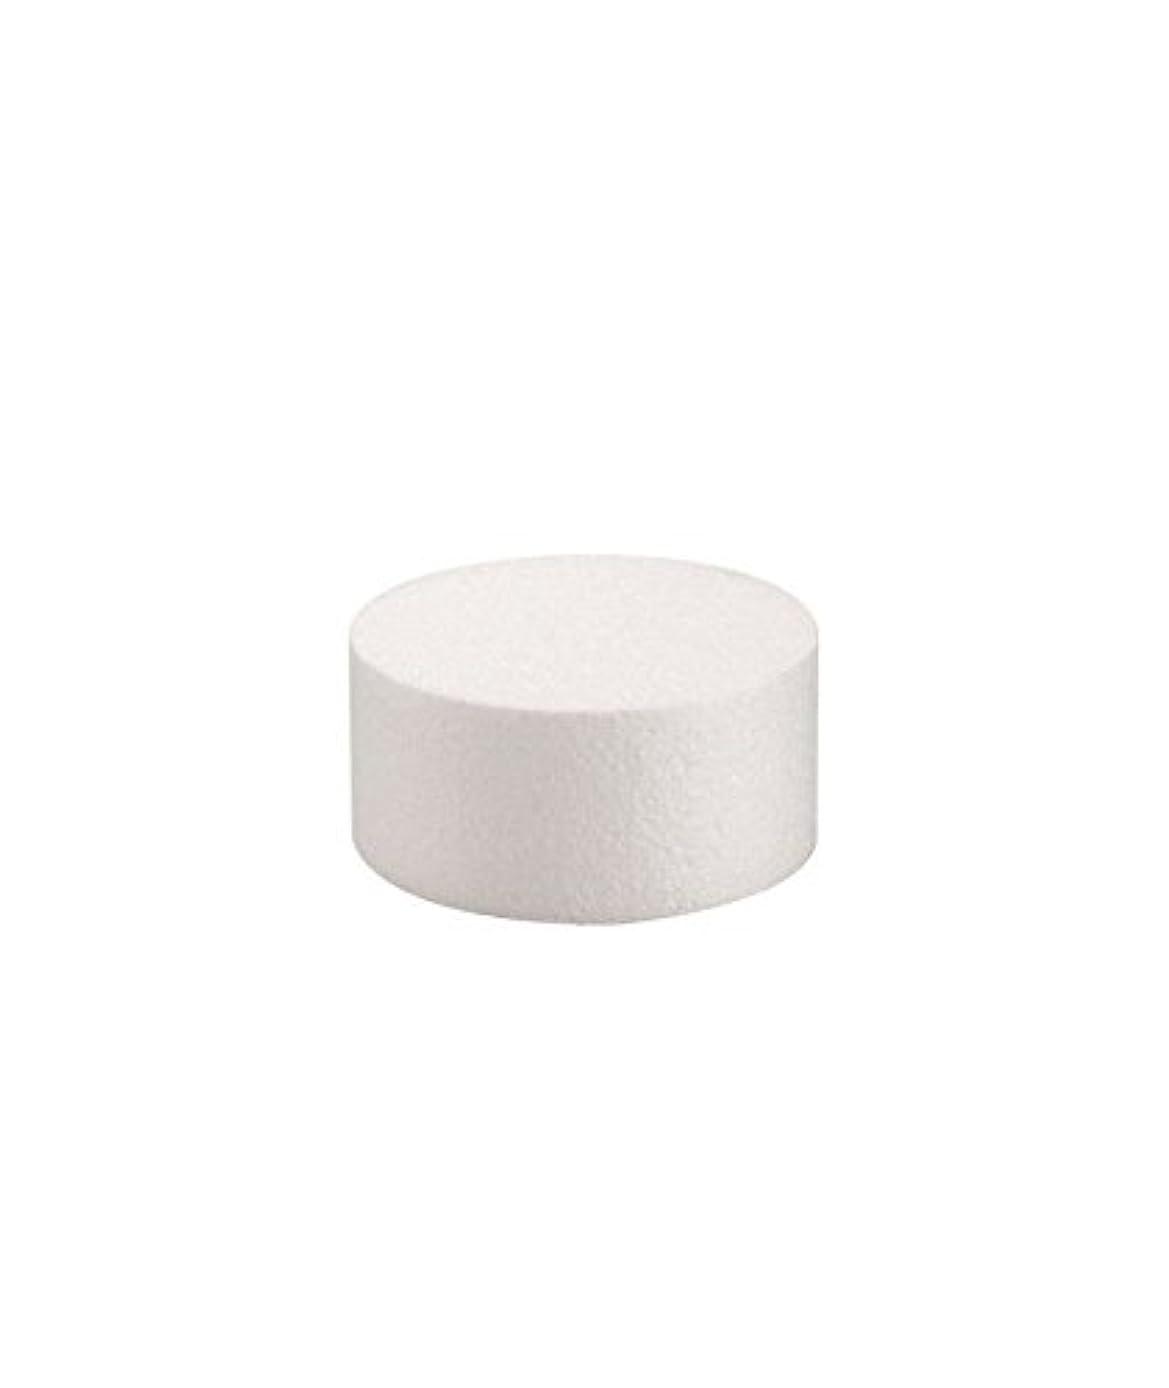 Glorex 3803?771?6?Styrofoam Disc, 5?x 8?x 4?cm?–?White